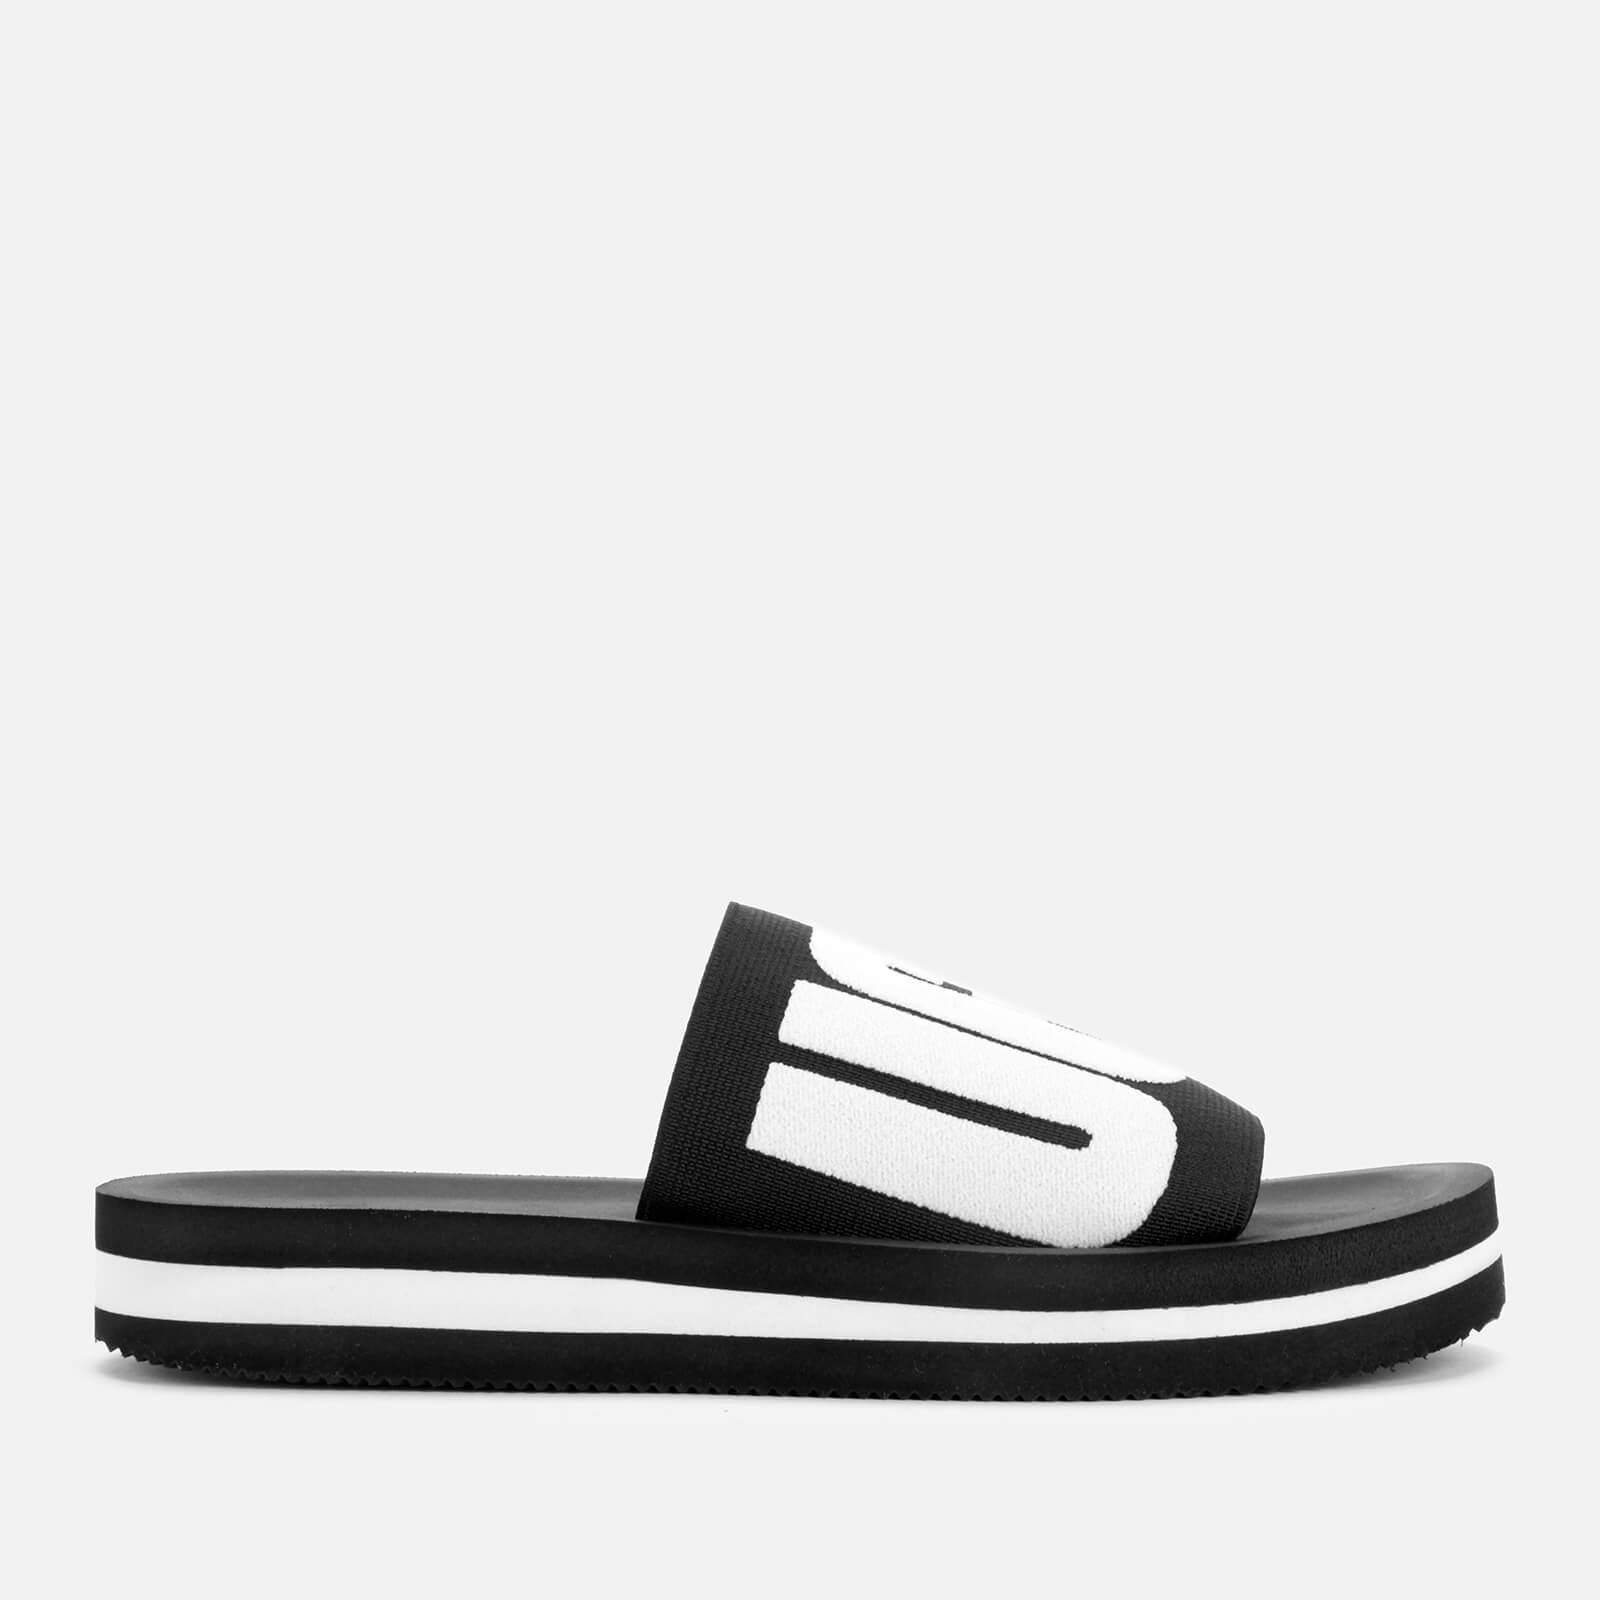 3f92a860b UGG Women's Zuma Graphic Slide Sandals - Black | FREE UK Delivery | Allsole